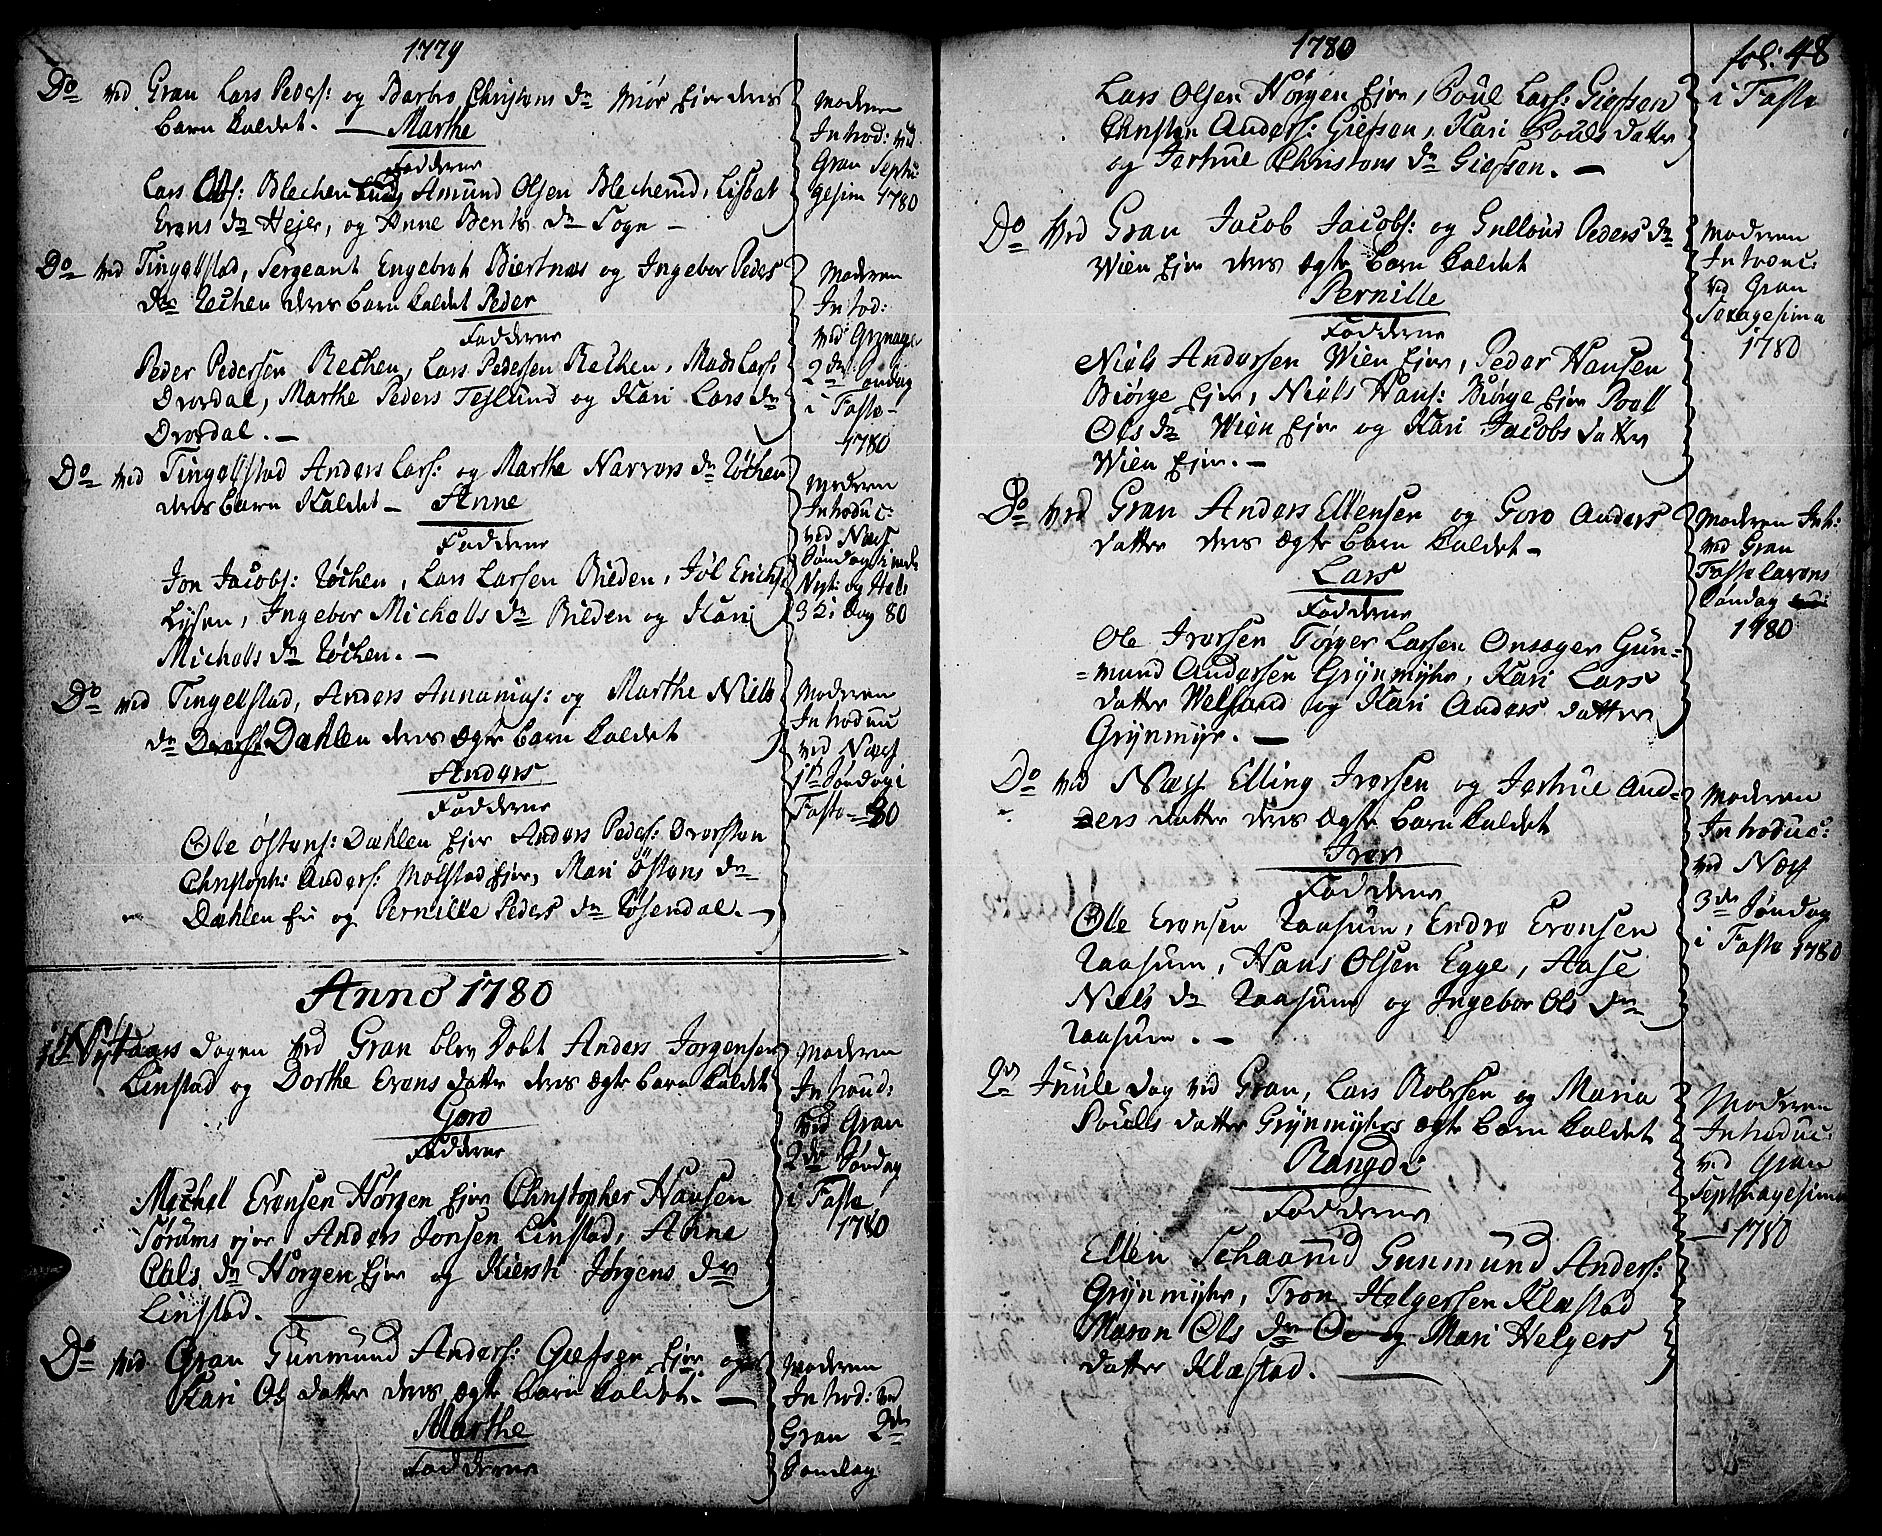 SAH, Gran prestekontor, Ministerialbok nr. 5, 1776-1788, s. 48